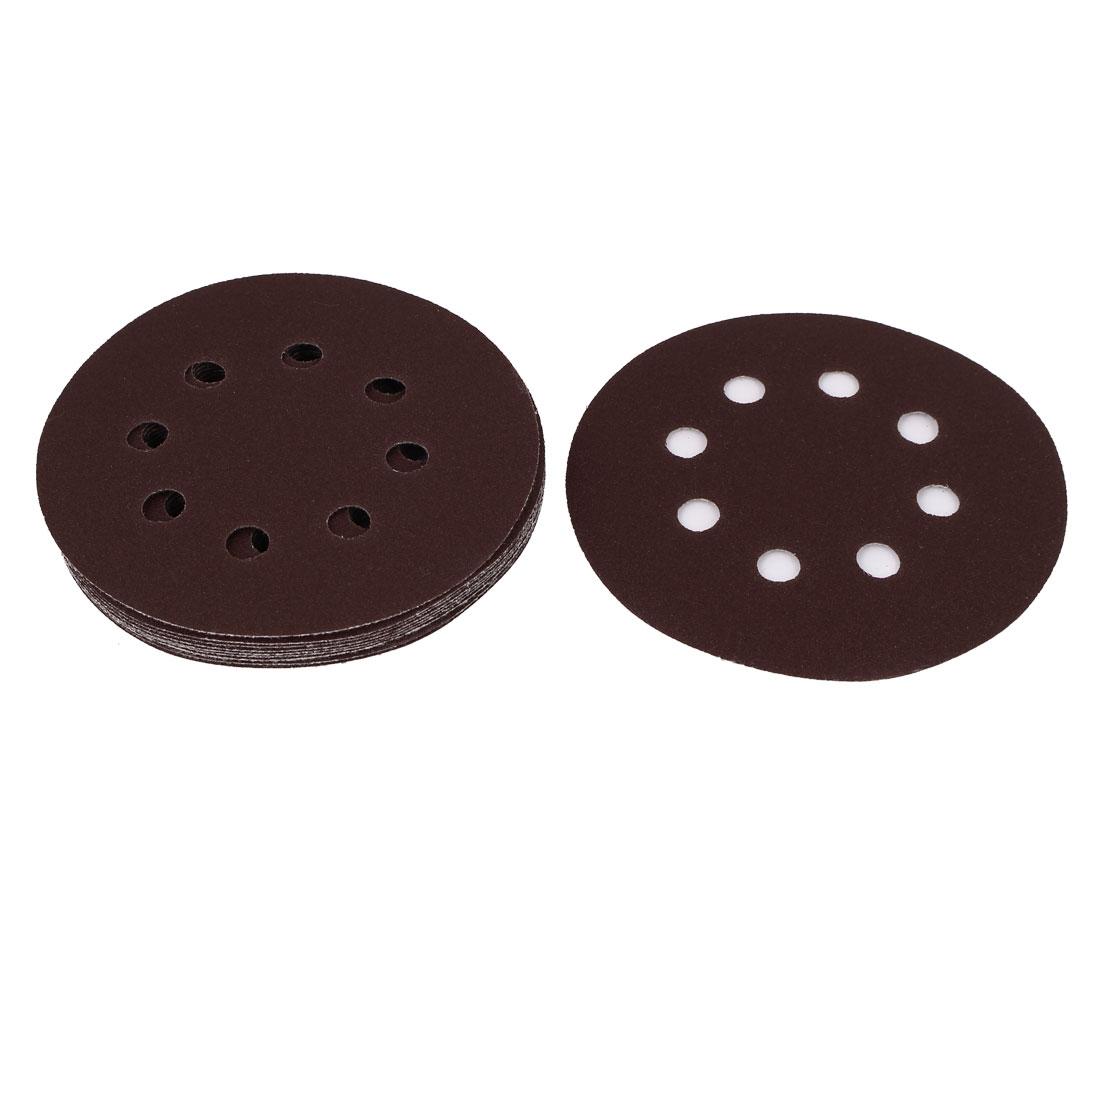 "5"" Dia 150 Grit 8 Holes Sanding Disc Sandpaper 10pcs for Oscillating Tool"